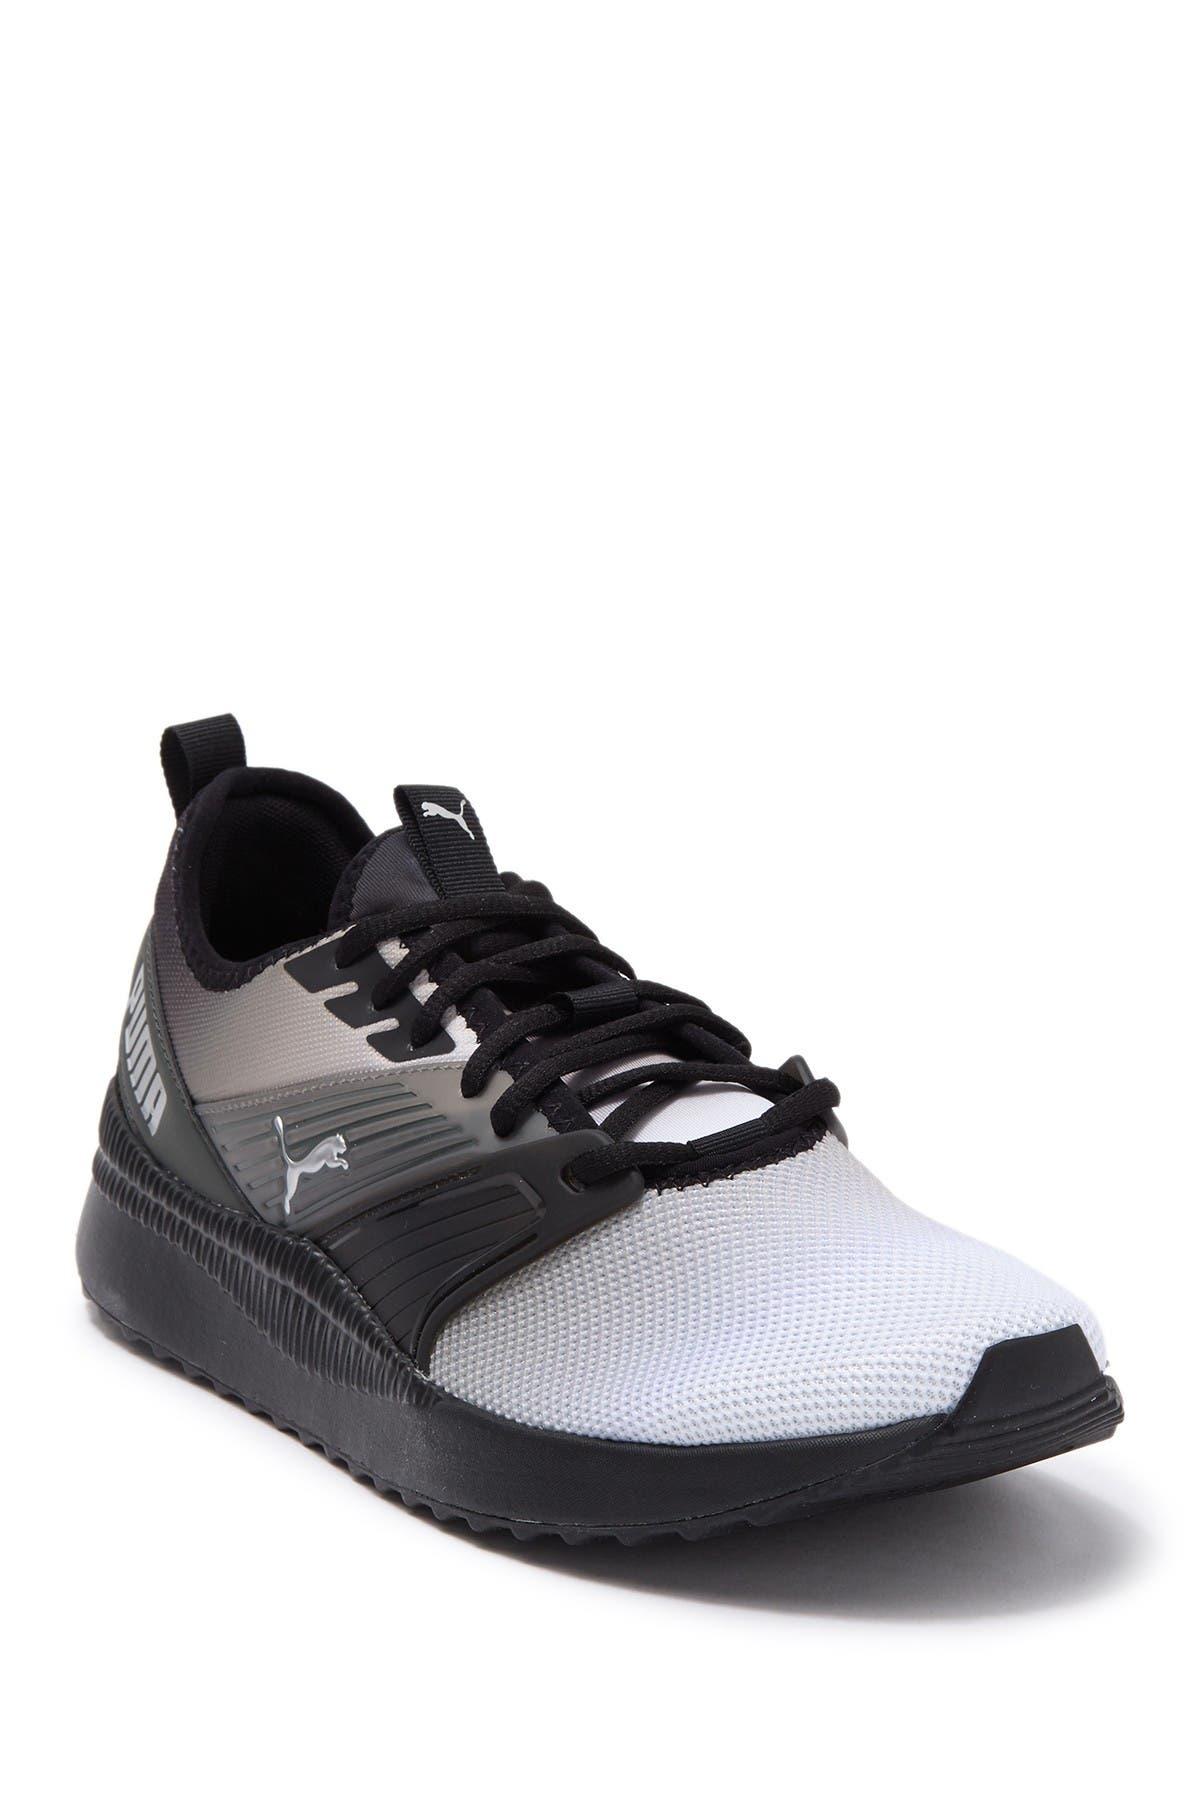 PUMA | Pacer Next FFWD Sneaker